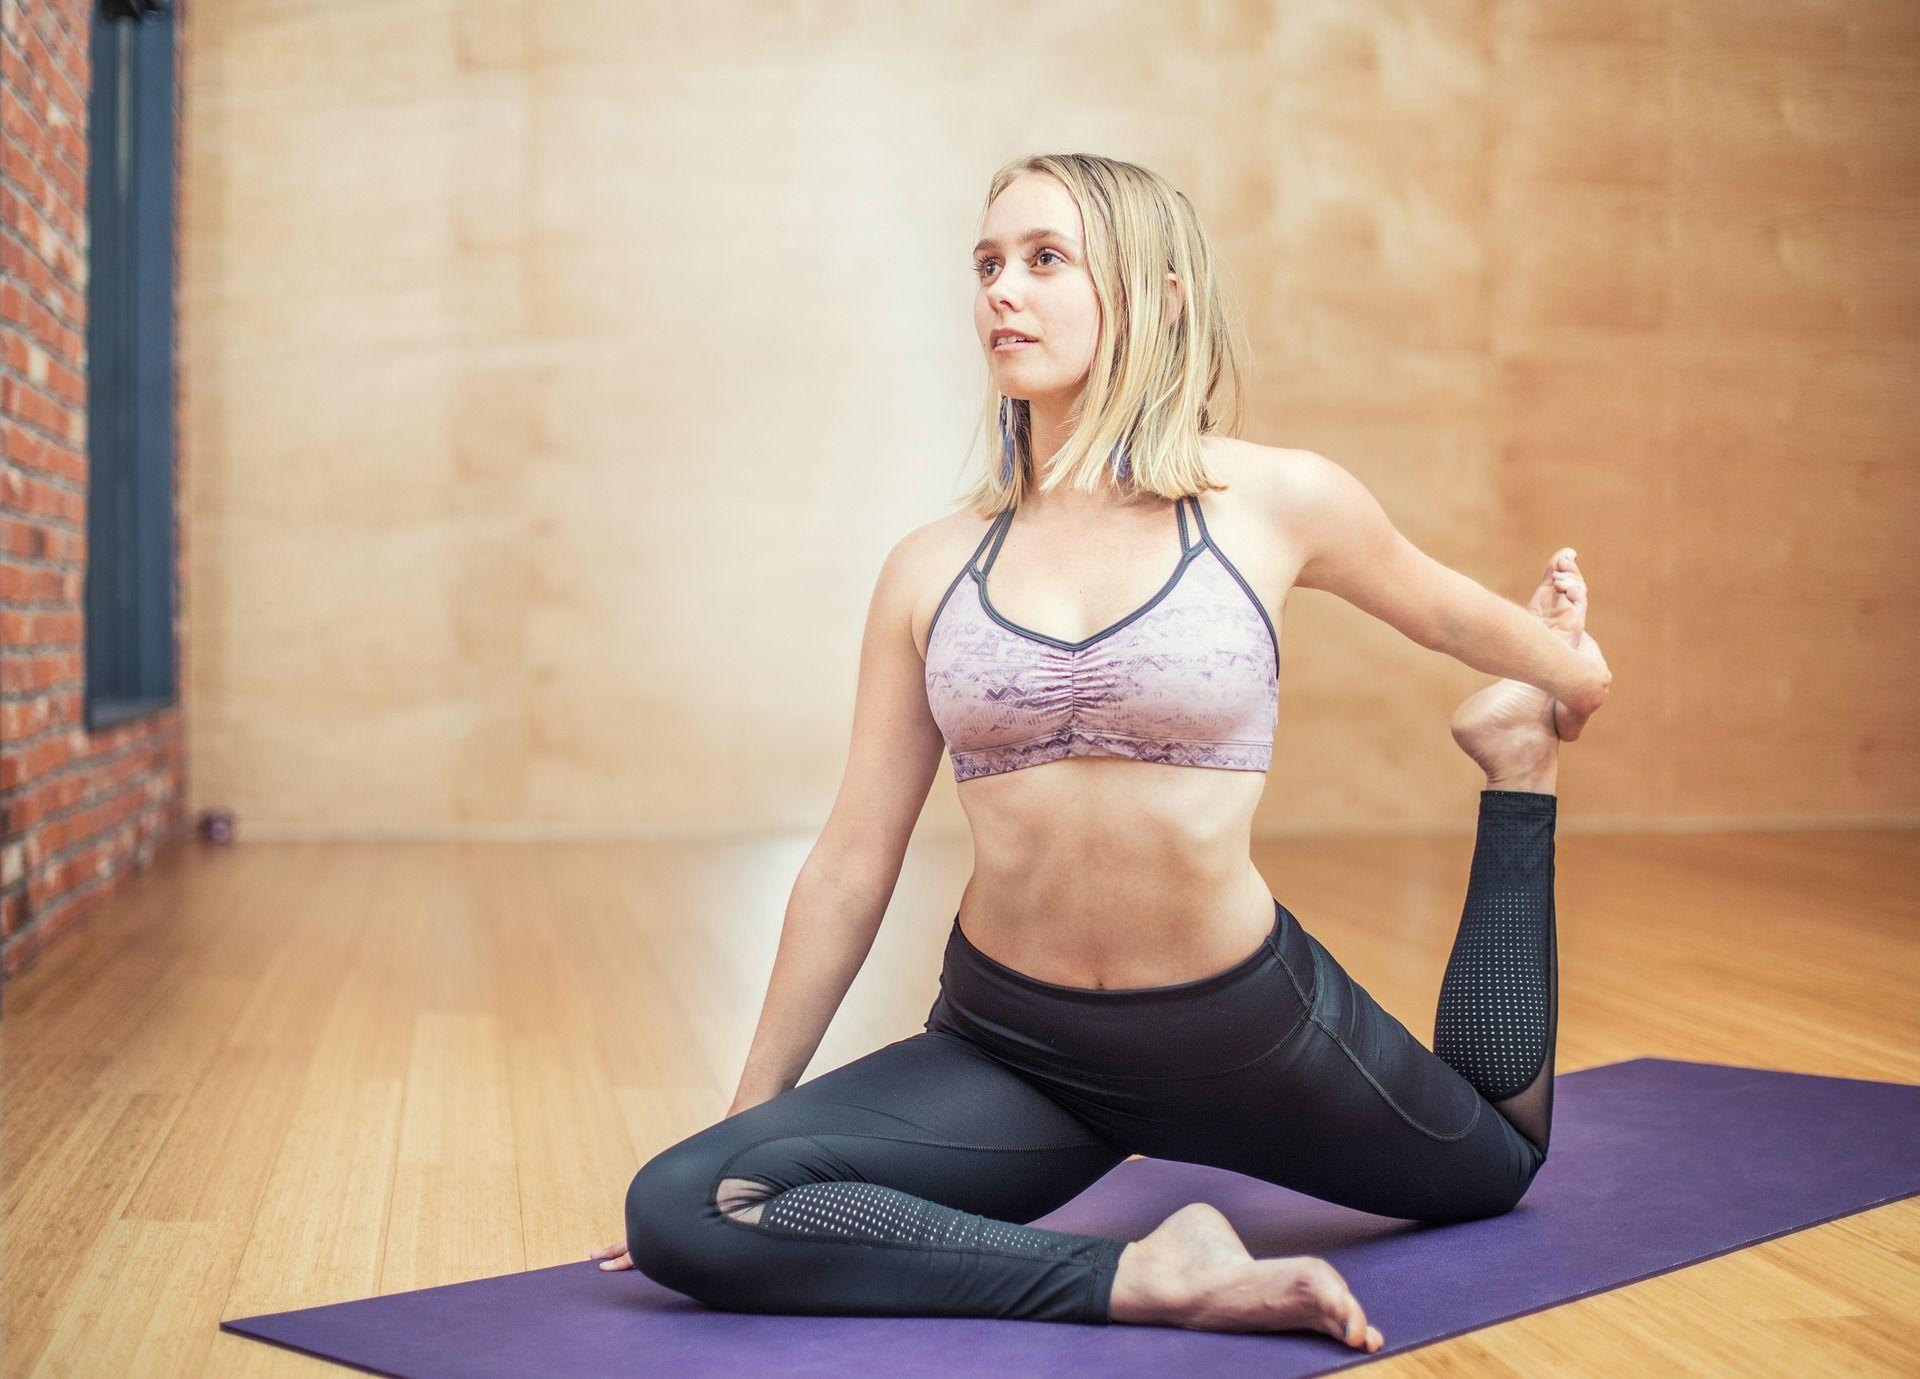 [Prime-Day] Yogamatte und Faszienrolle kostenlos bei Gymondo-Abo (entspricht 6,99 Euro / Monat)